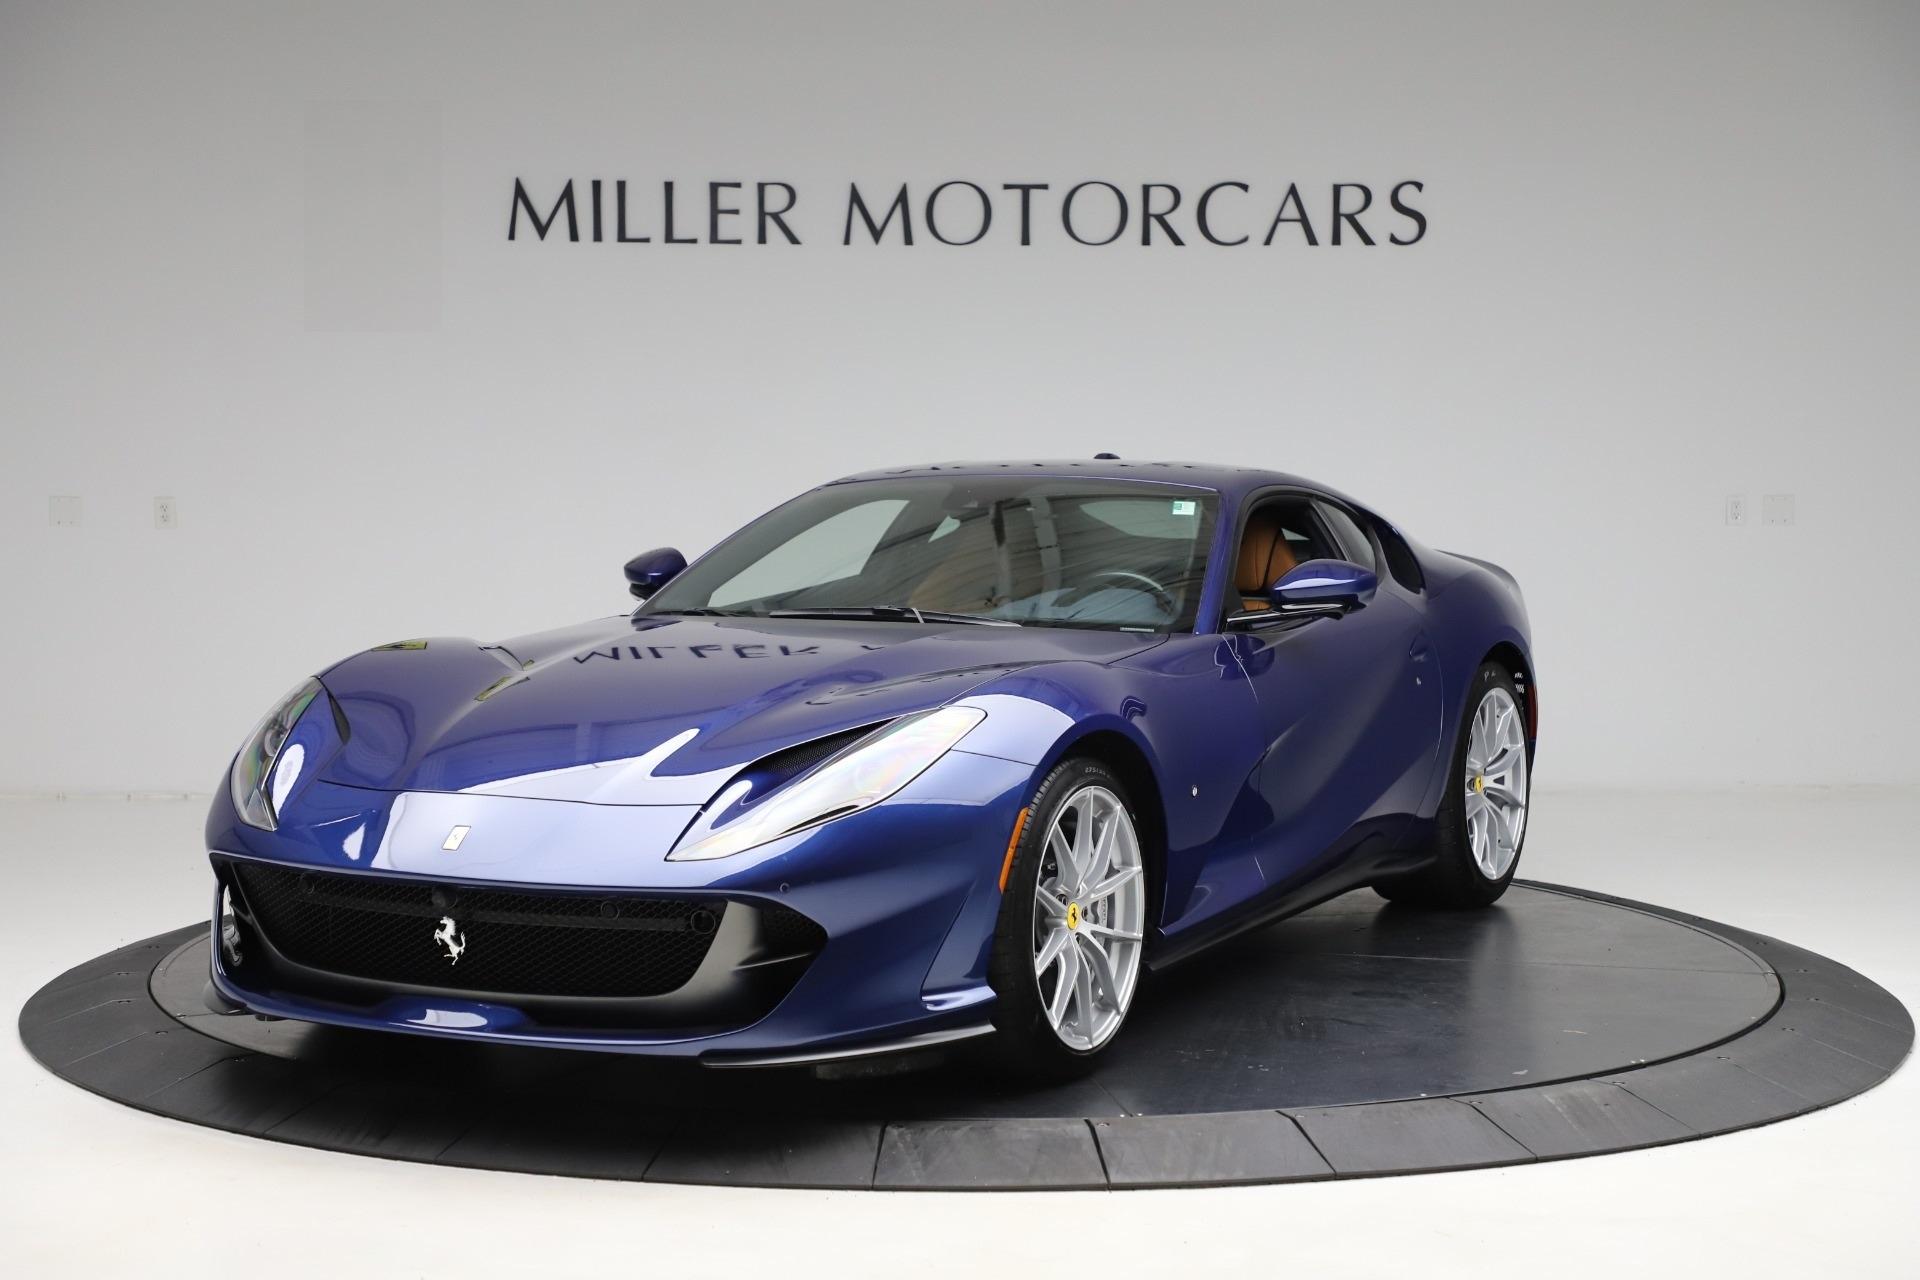 Pre Owned 2020 Ferrari 812 Superfast For Sale Ferrari Of Greenwich Stock 4666